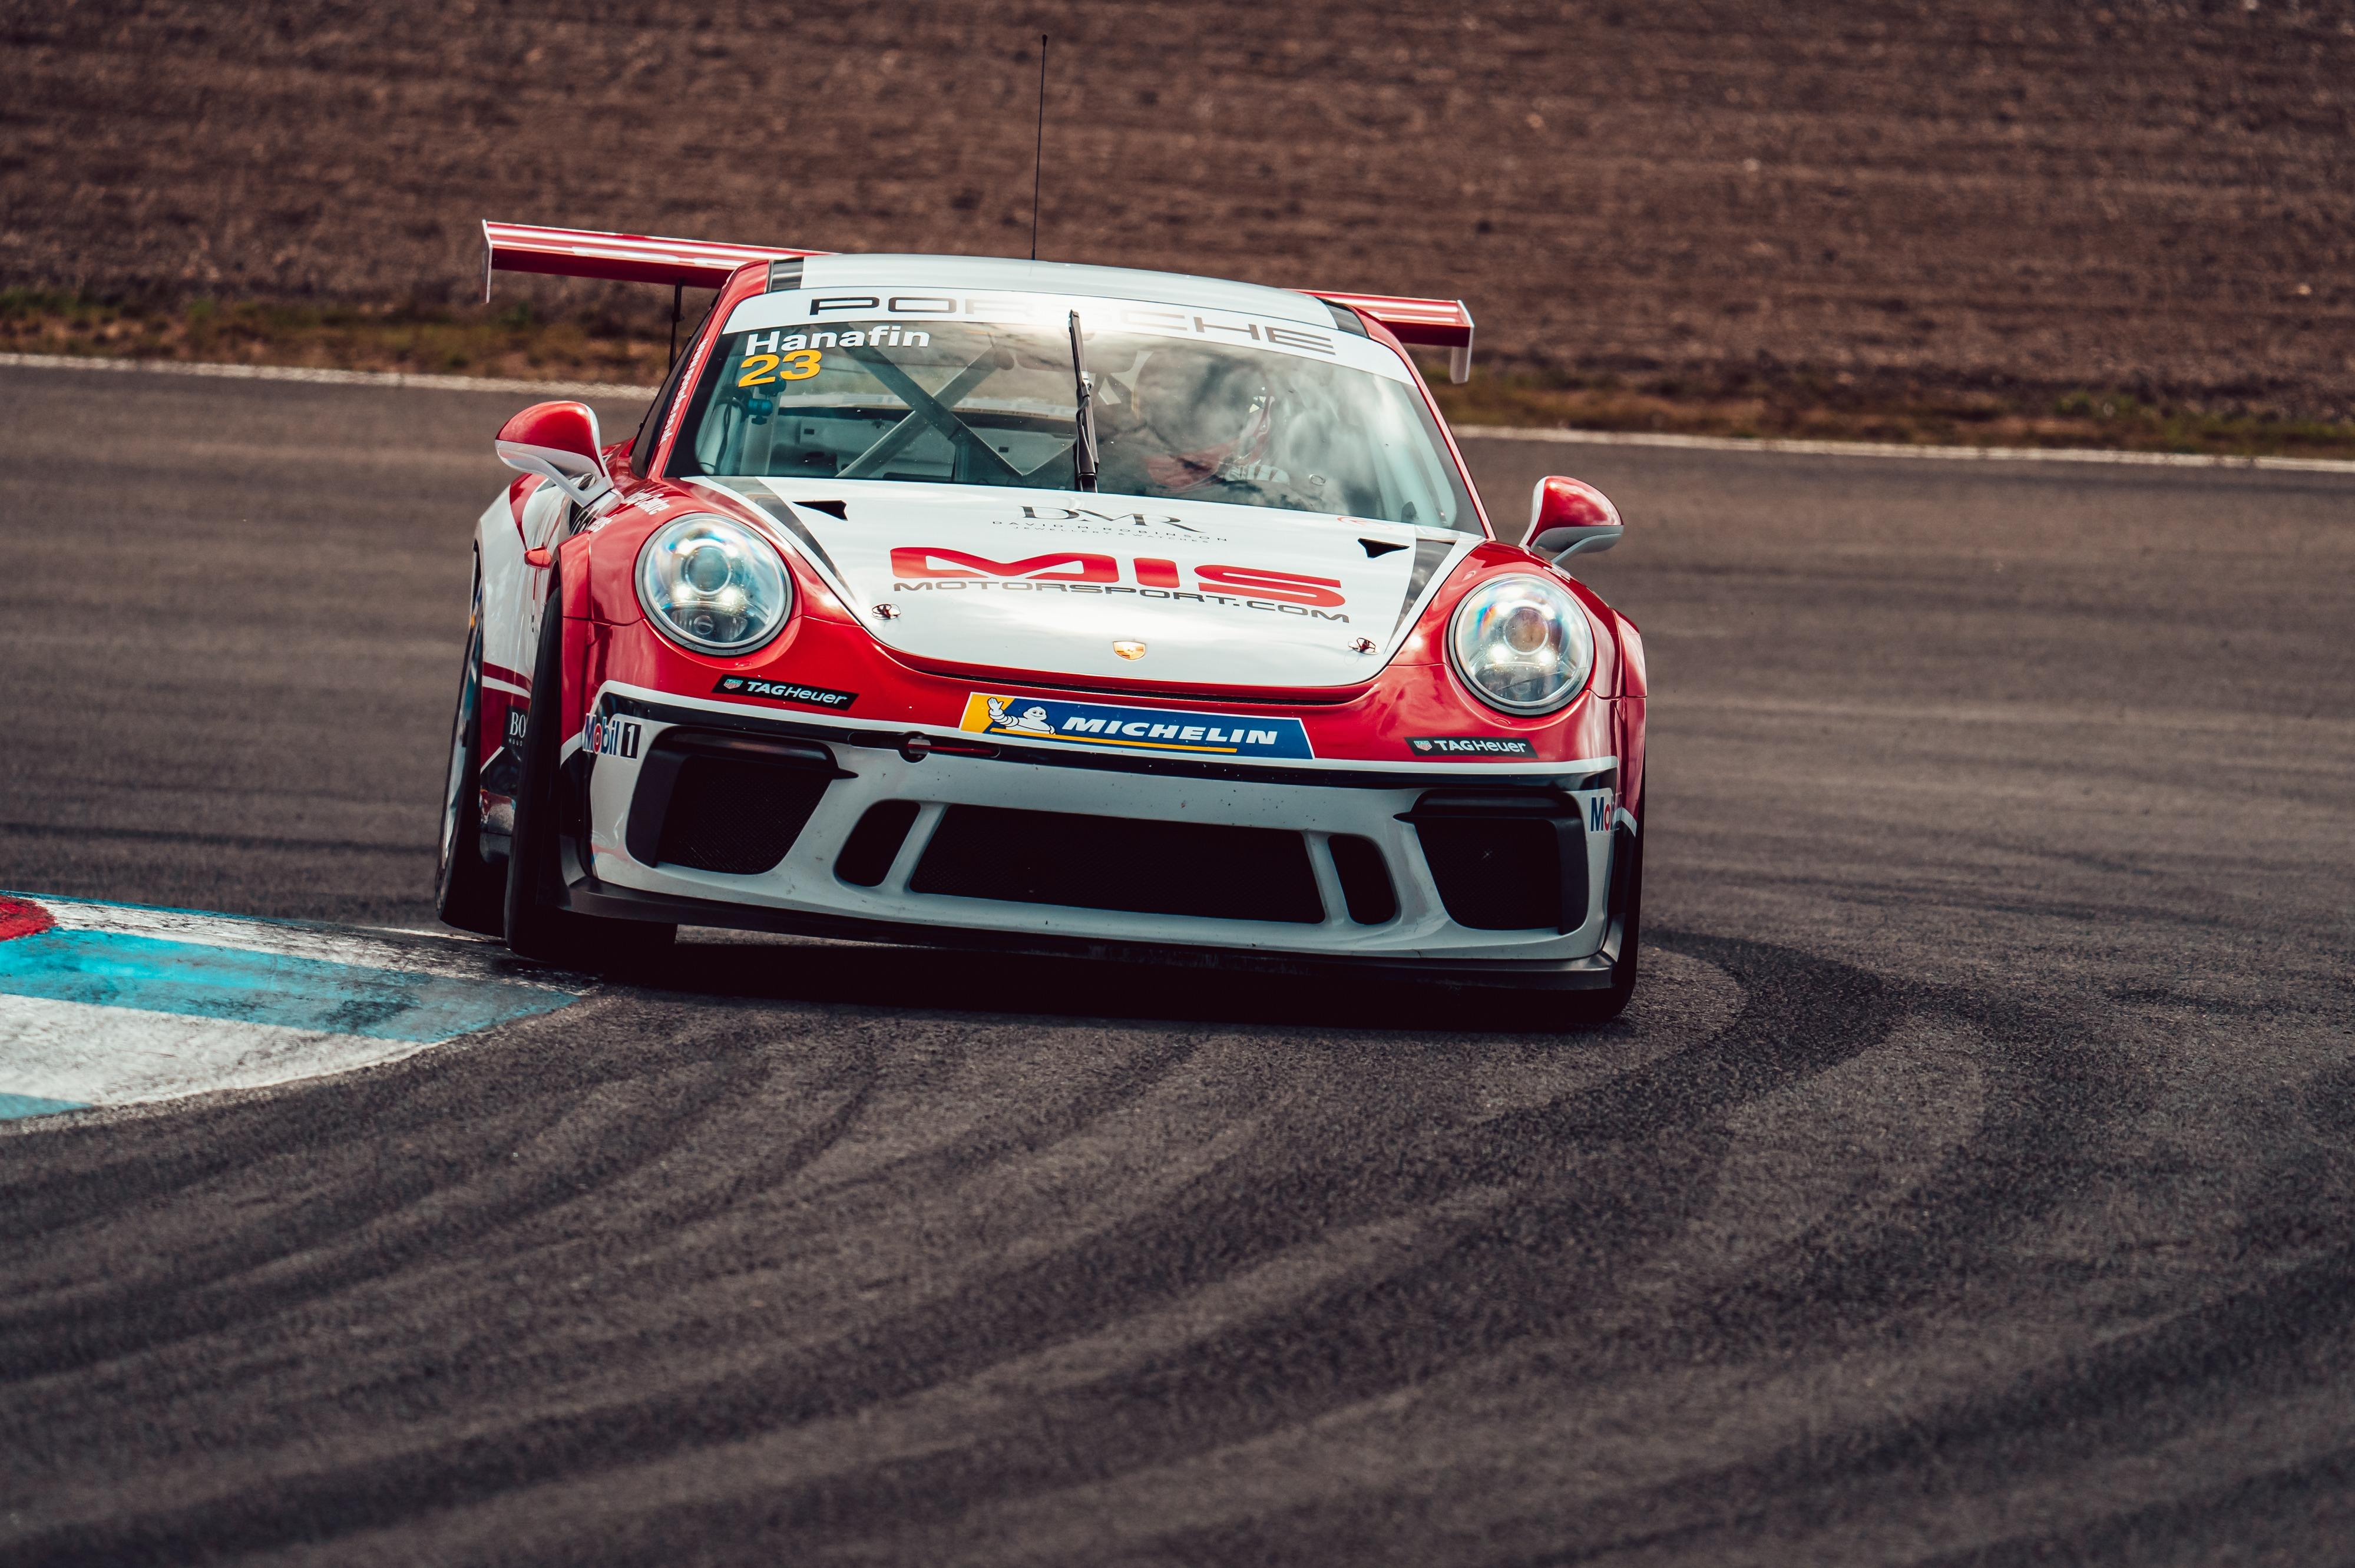 Lorcan Hanafin, Porsche Carrera Cup GB, Knockhill 2021